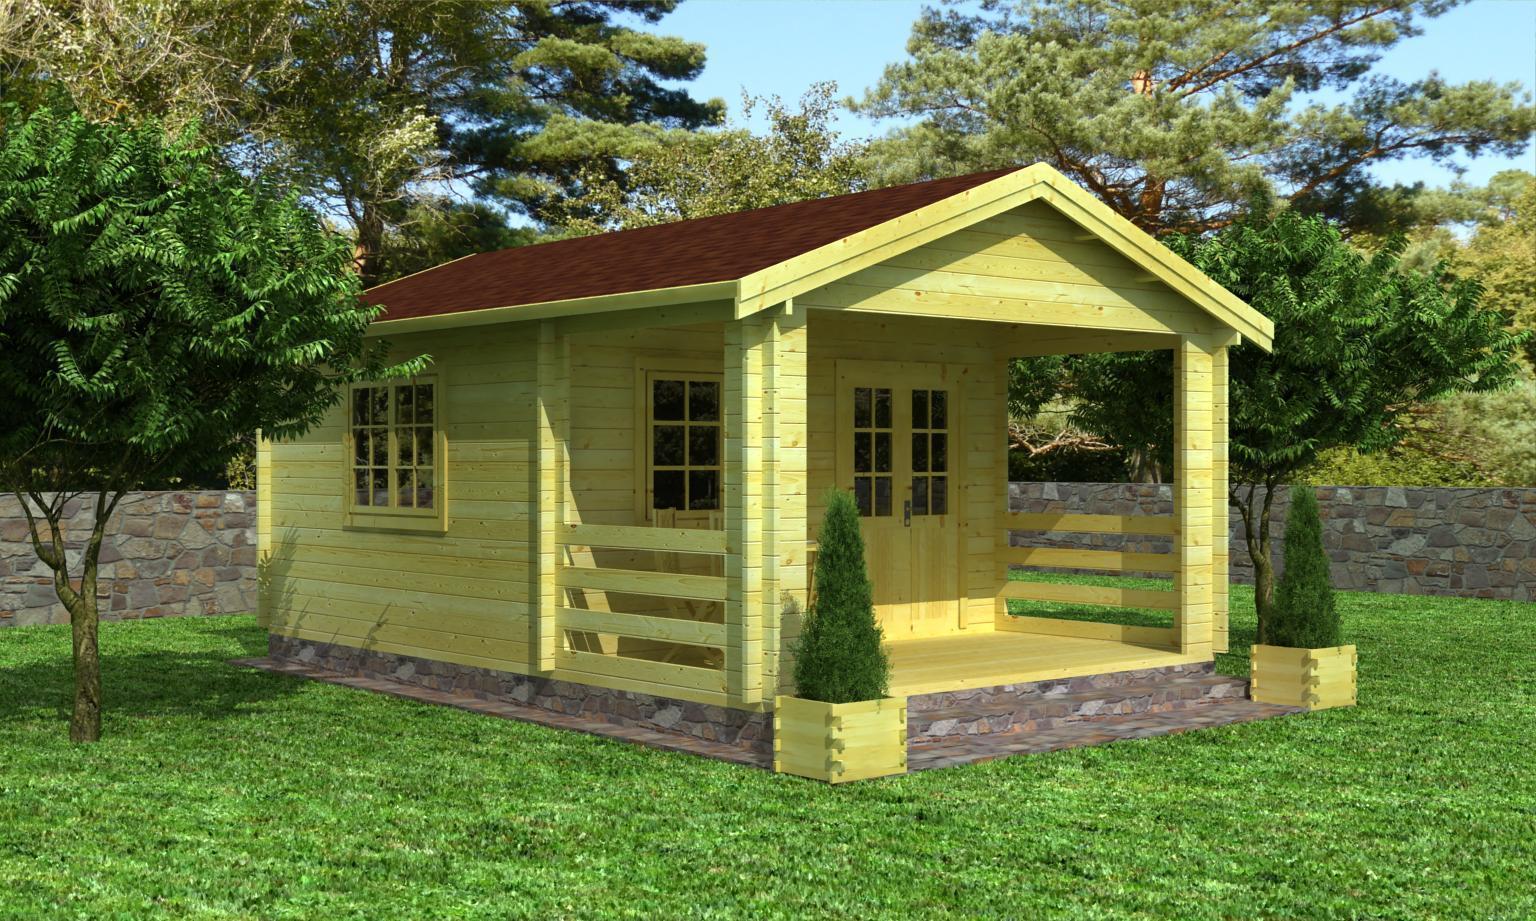 gartenhaus modell regensburg 44 sams gartenhaus shop. Black Bedroom Furniture Sets. Home Design Ideas